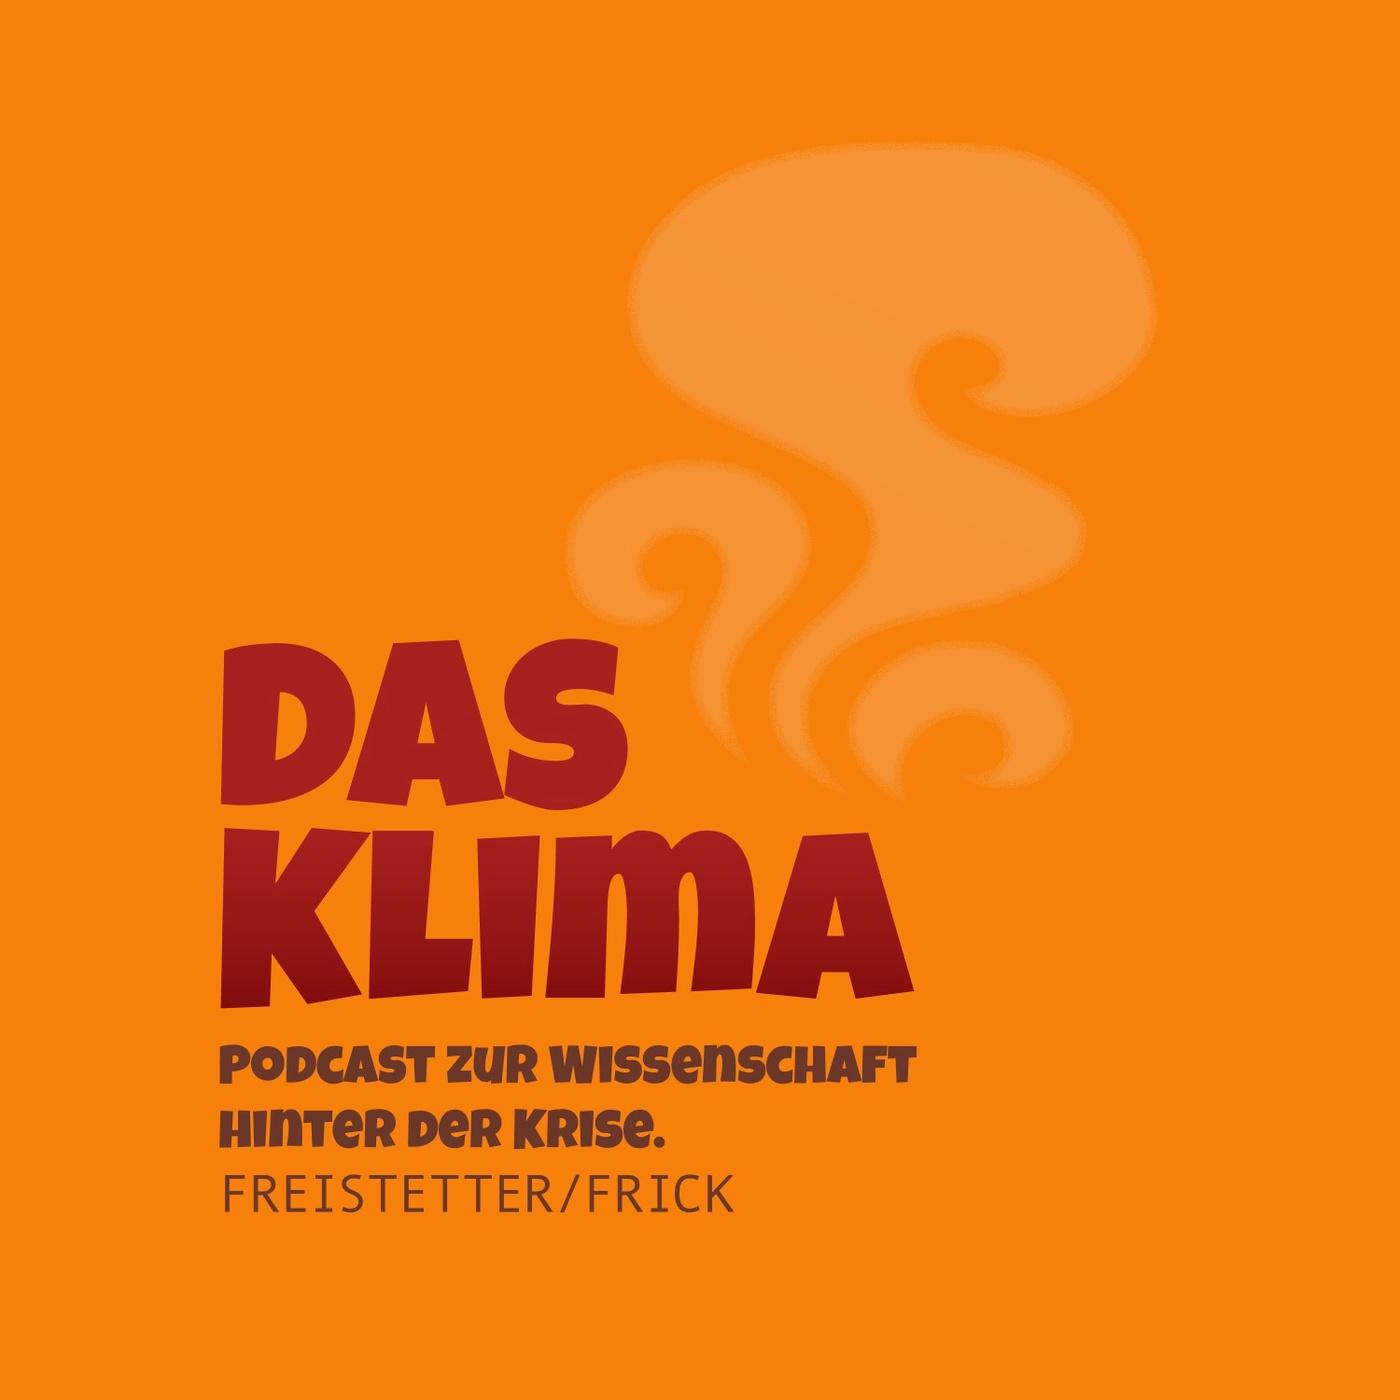 DK008 - Wir schubsen an der Klimaschaukel